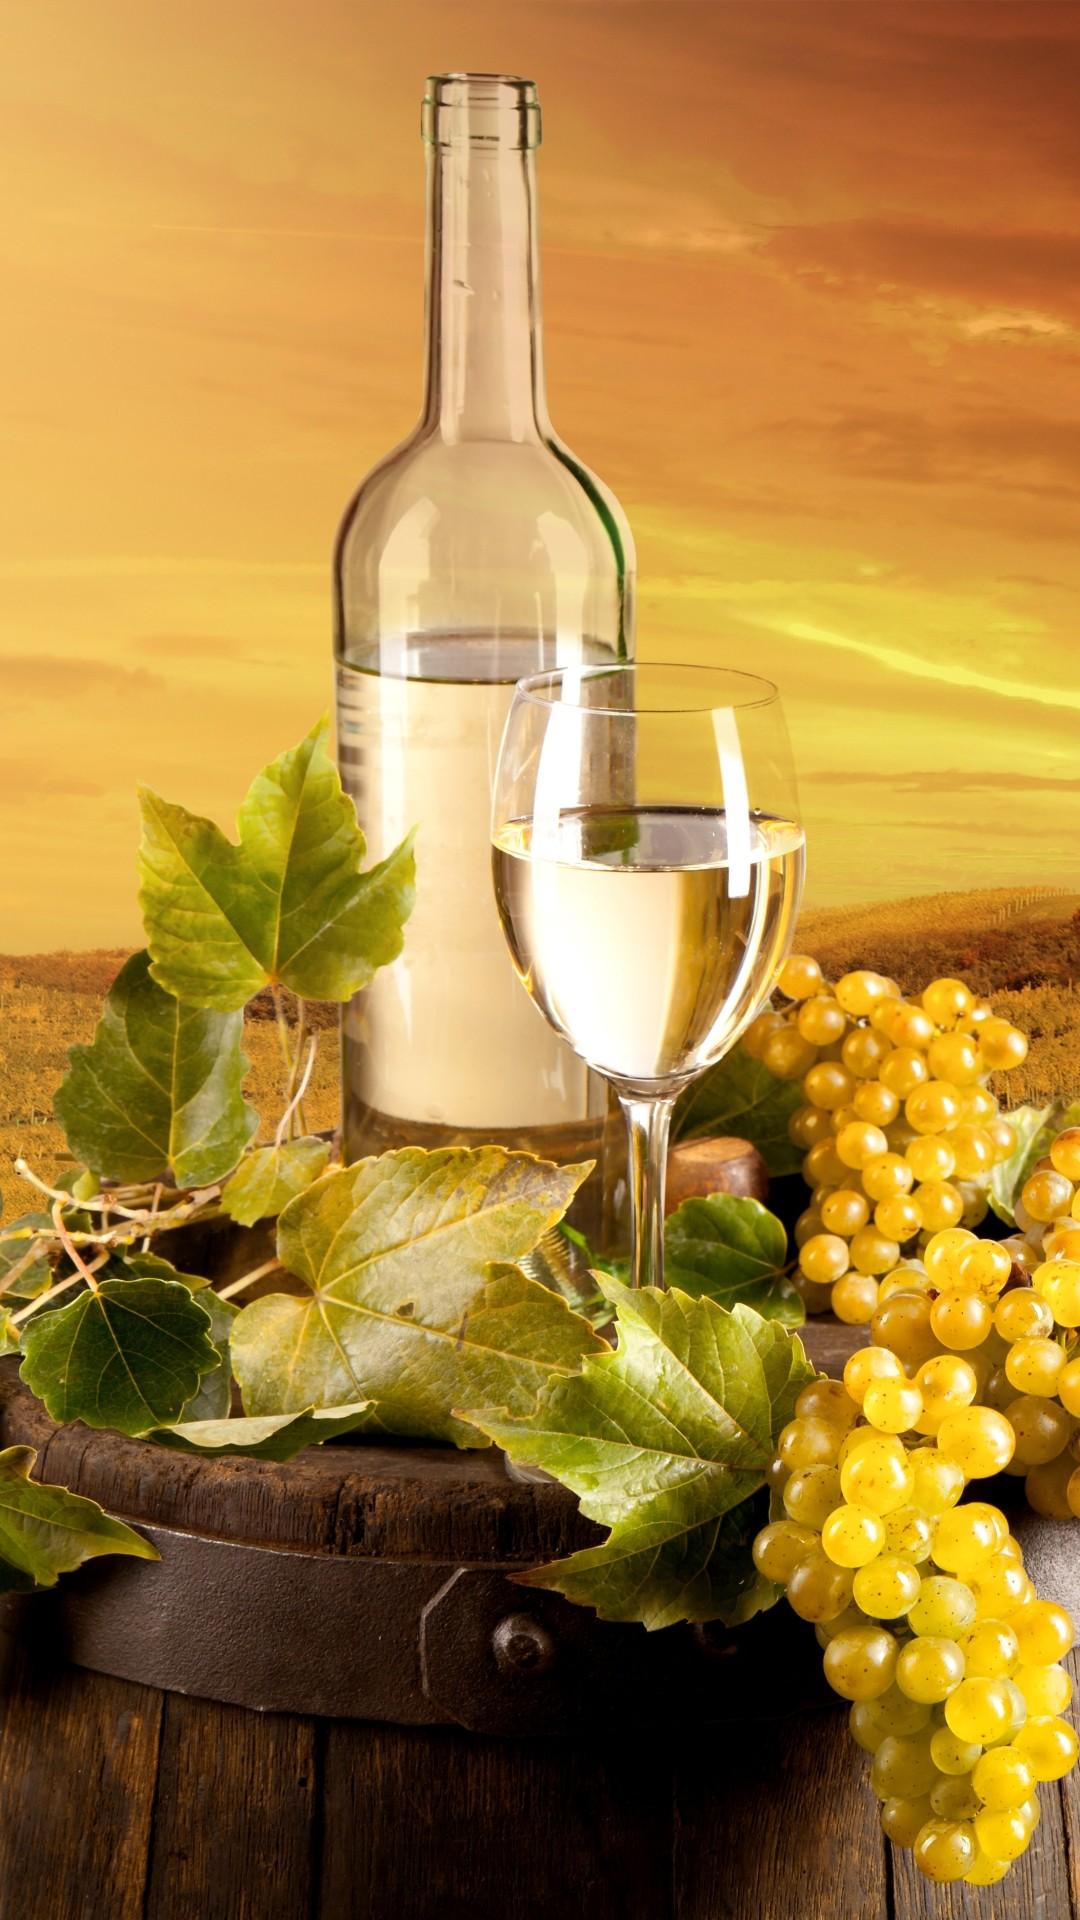 Vineyard Vines phone wallpaper